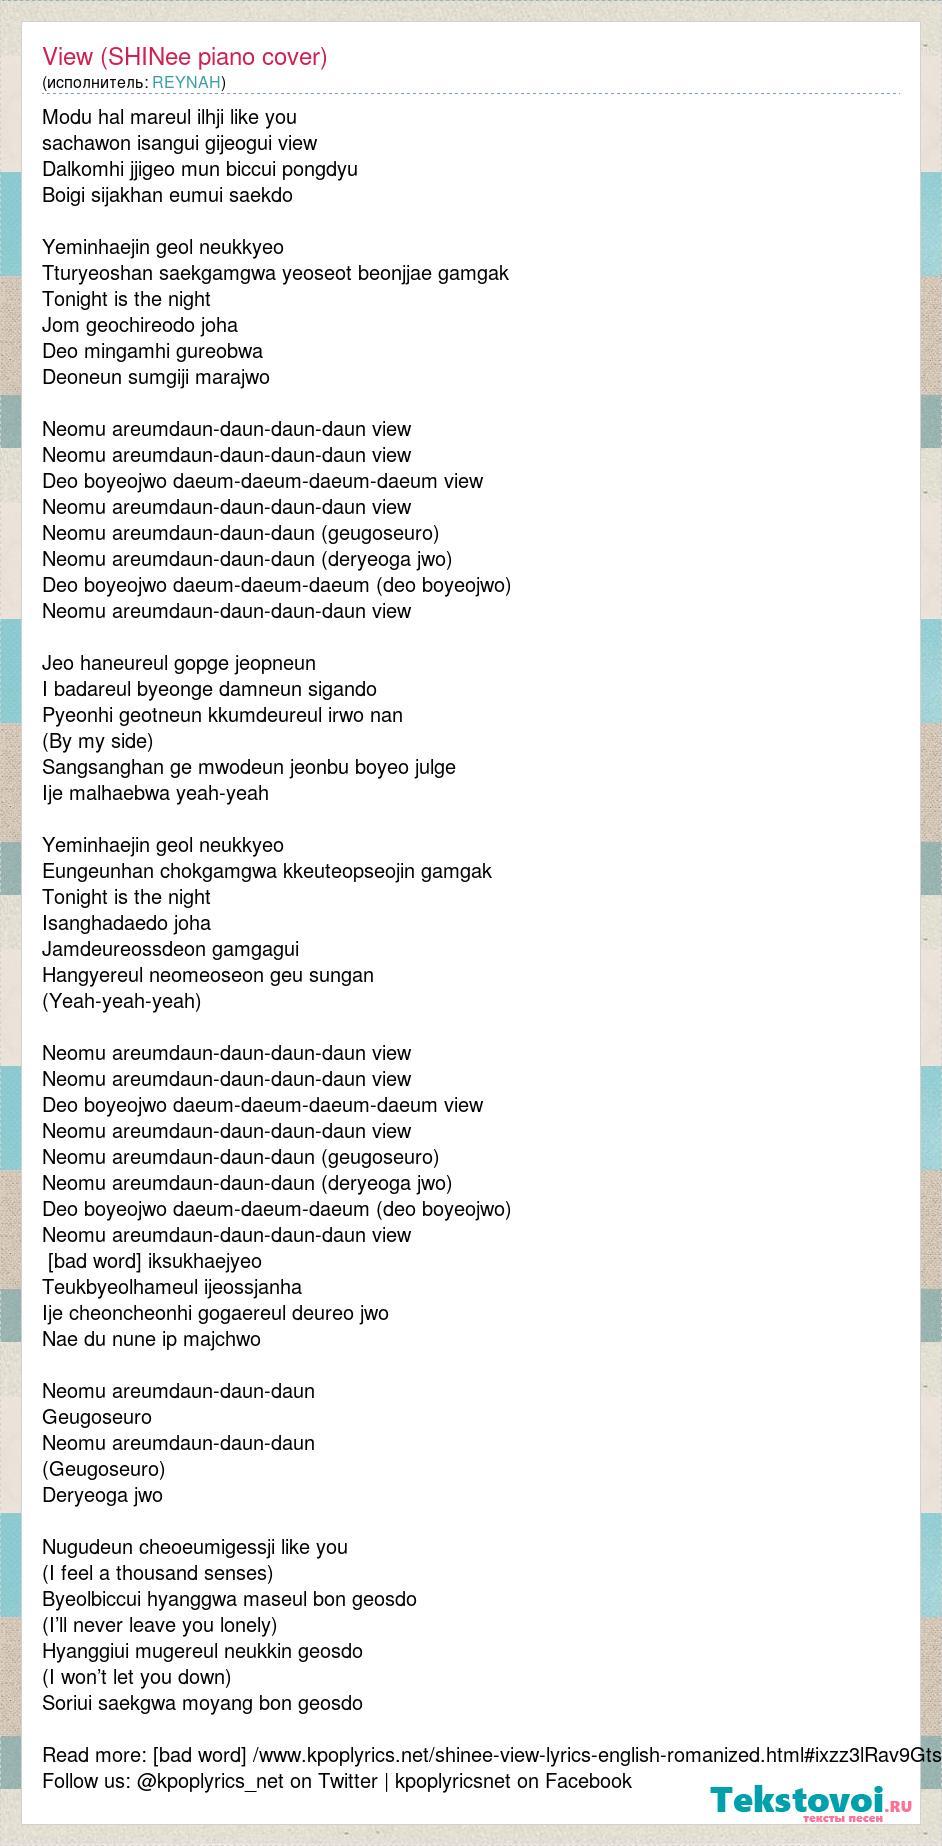 REYNAH: View (SHINee piano cover) слова песни